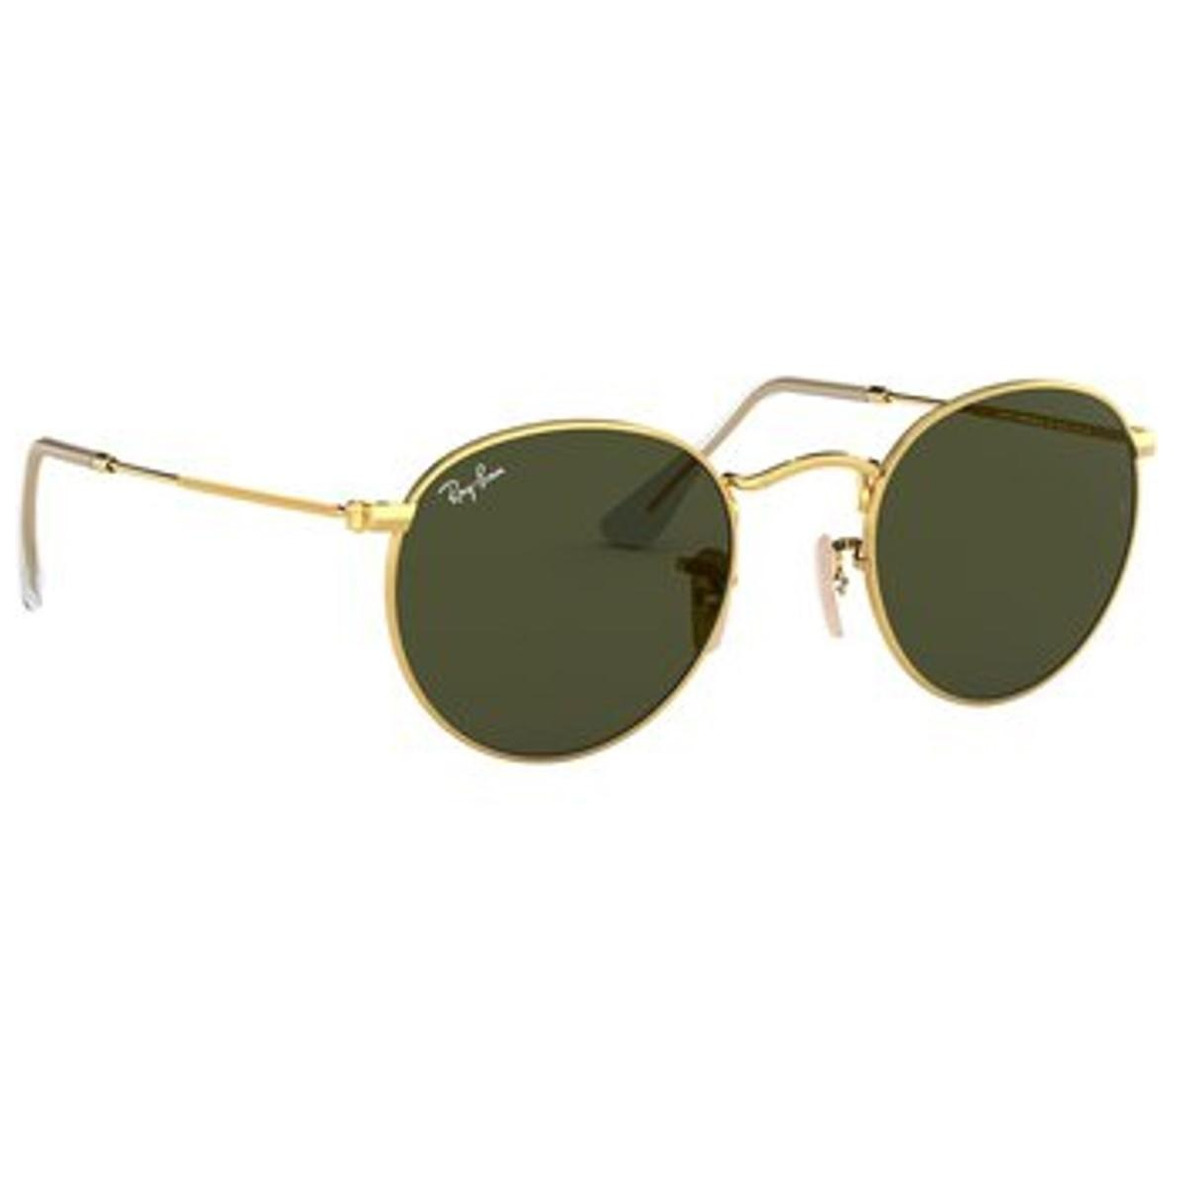 c9b3d8b511 Lentes De Sol Ray-ban Round Metal Para Hombre-verde - $ 5,957.00 en ...